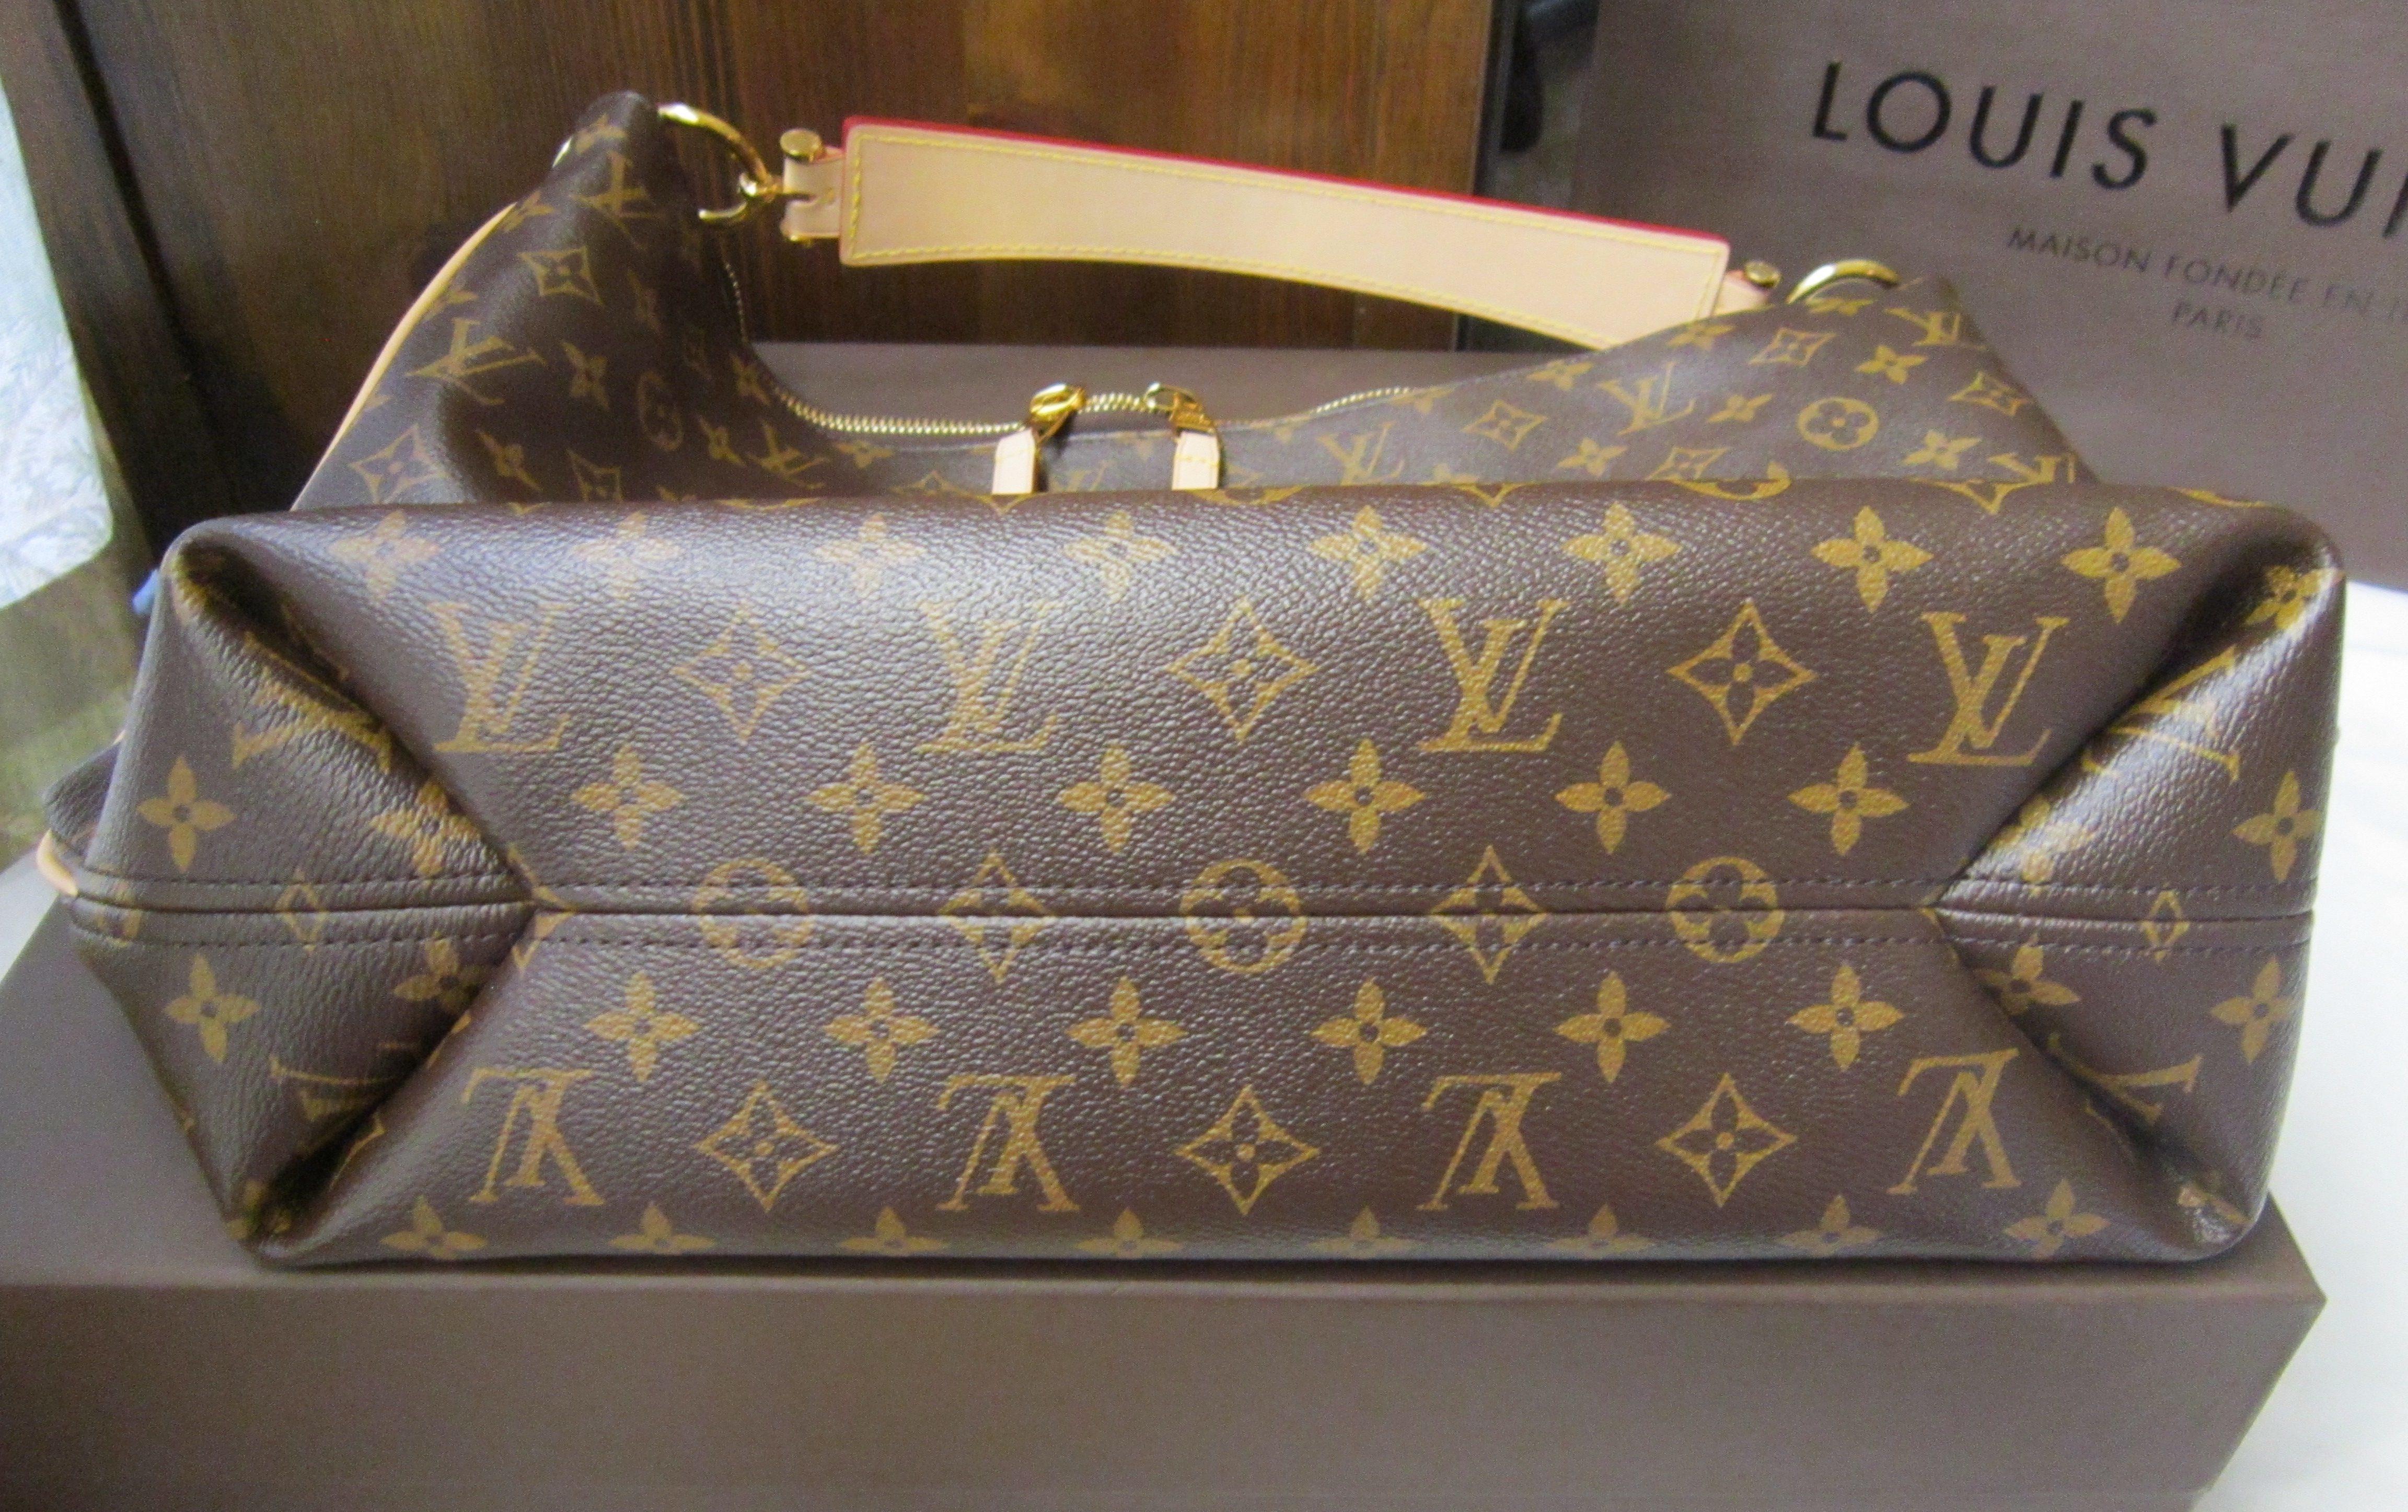 prada handbag replicas - Top 154 Complaints and Reviews about Louis Vuitton | Page 3